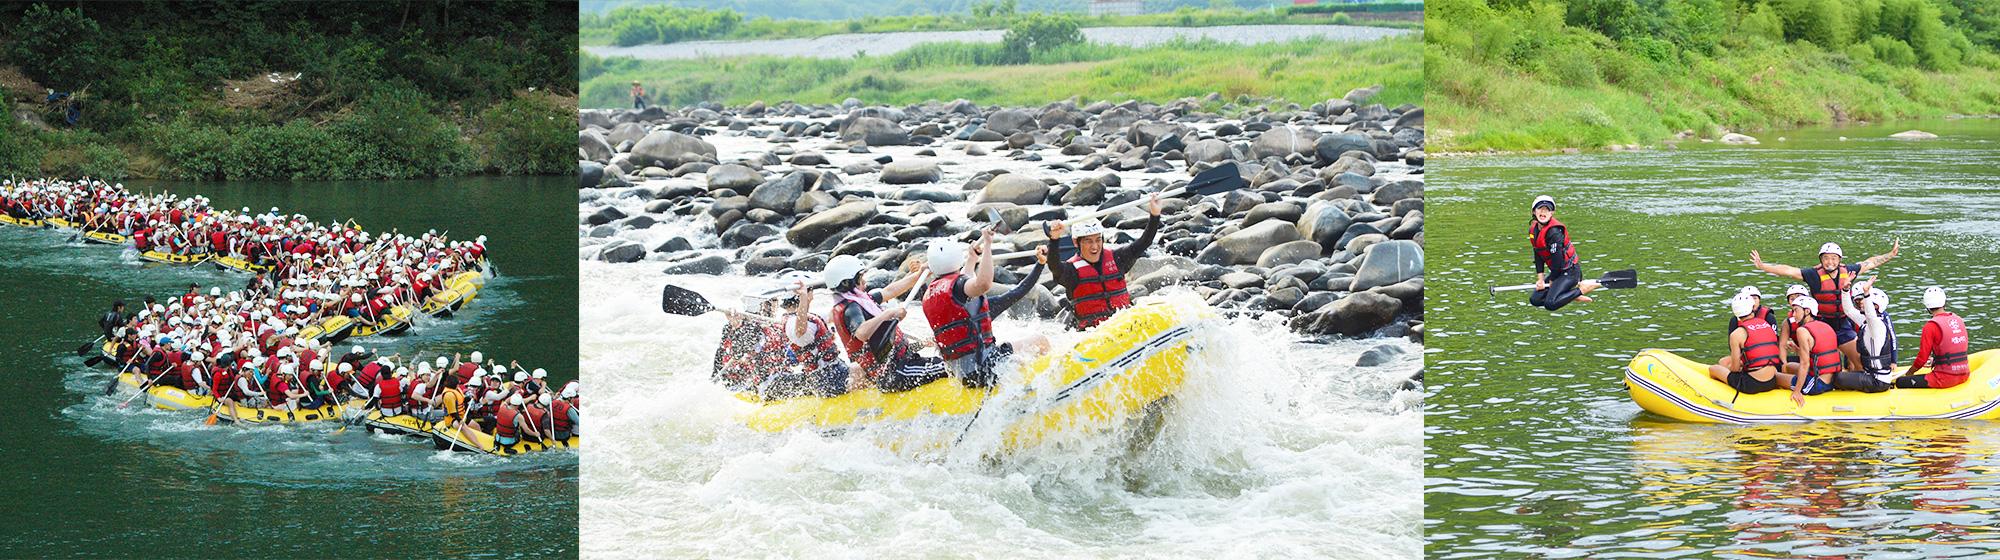 Busan Day Tour – White Water Rafting and Donguibogam village tour (Jun 4 – Aug 29) | KoreaTravelEasy